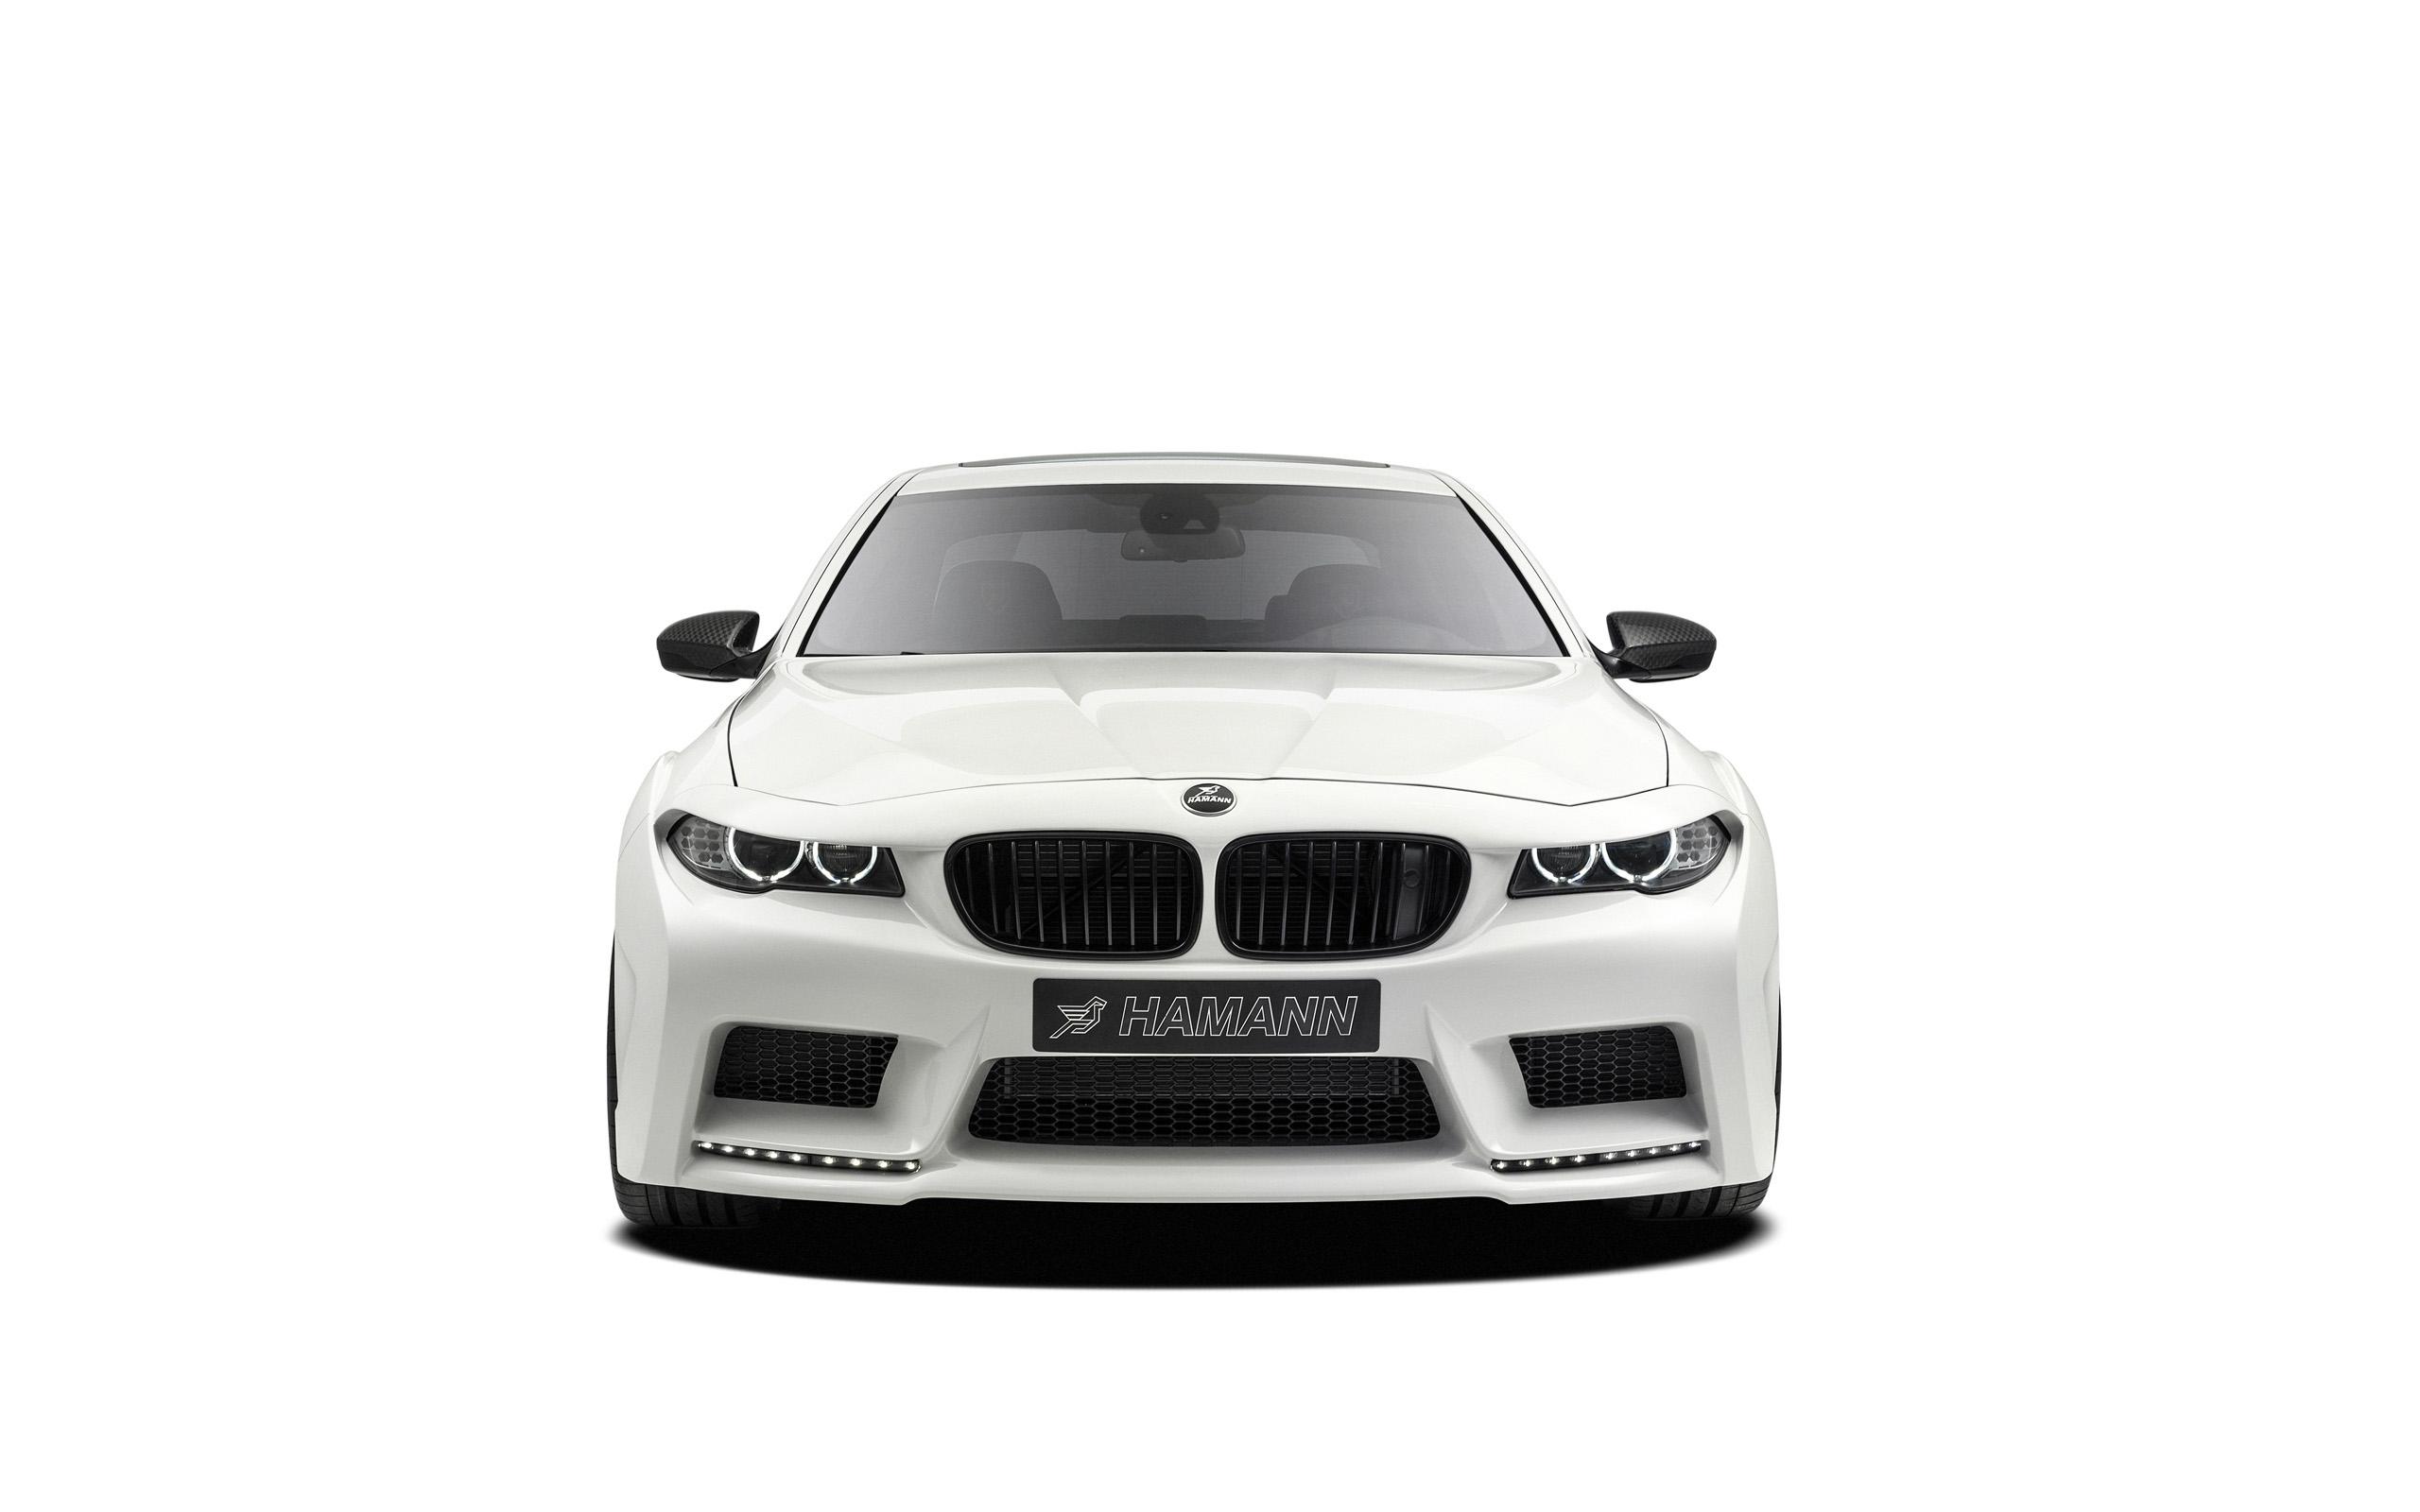 2013 Hamann BMW M5 Mi5Sion - Studio - White Background - 1 - 2560x1600 - Wallpaper